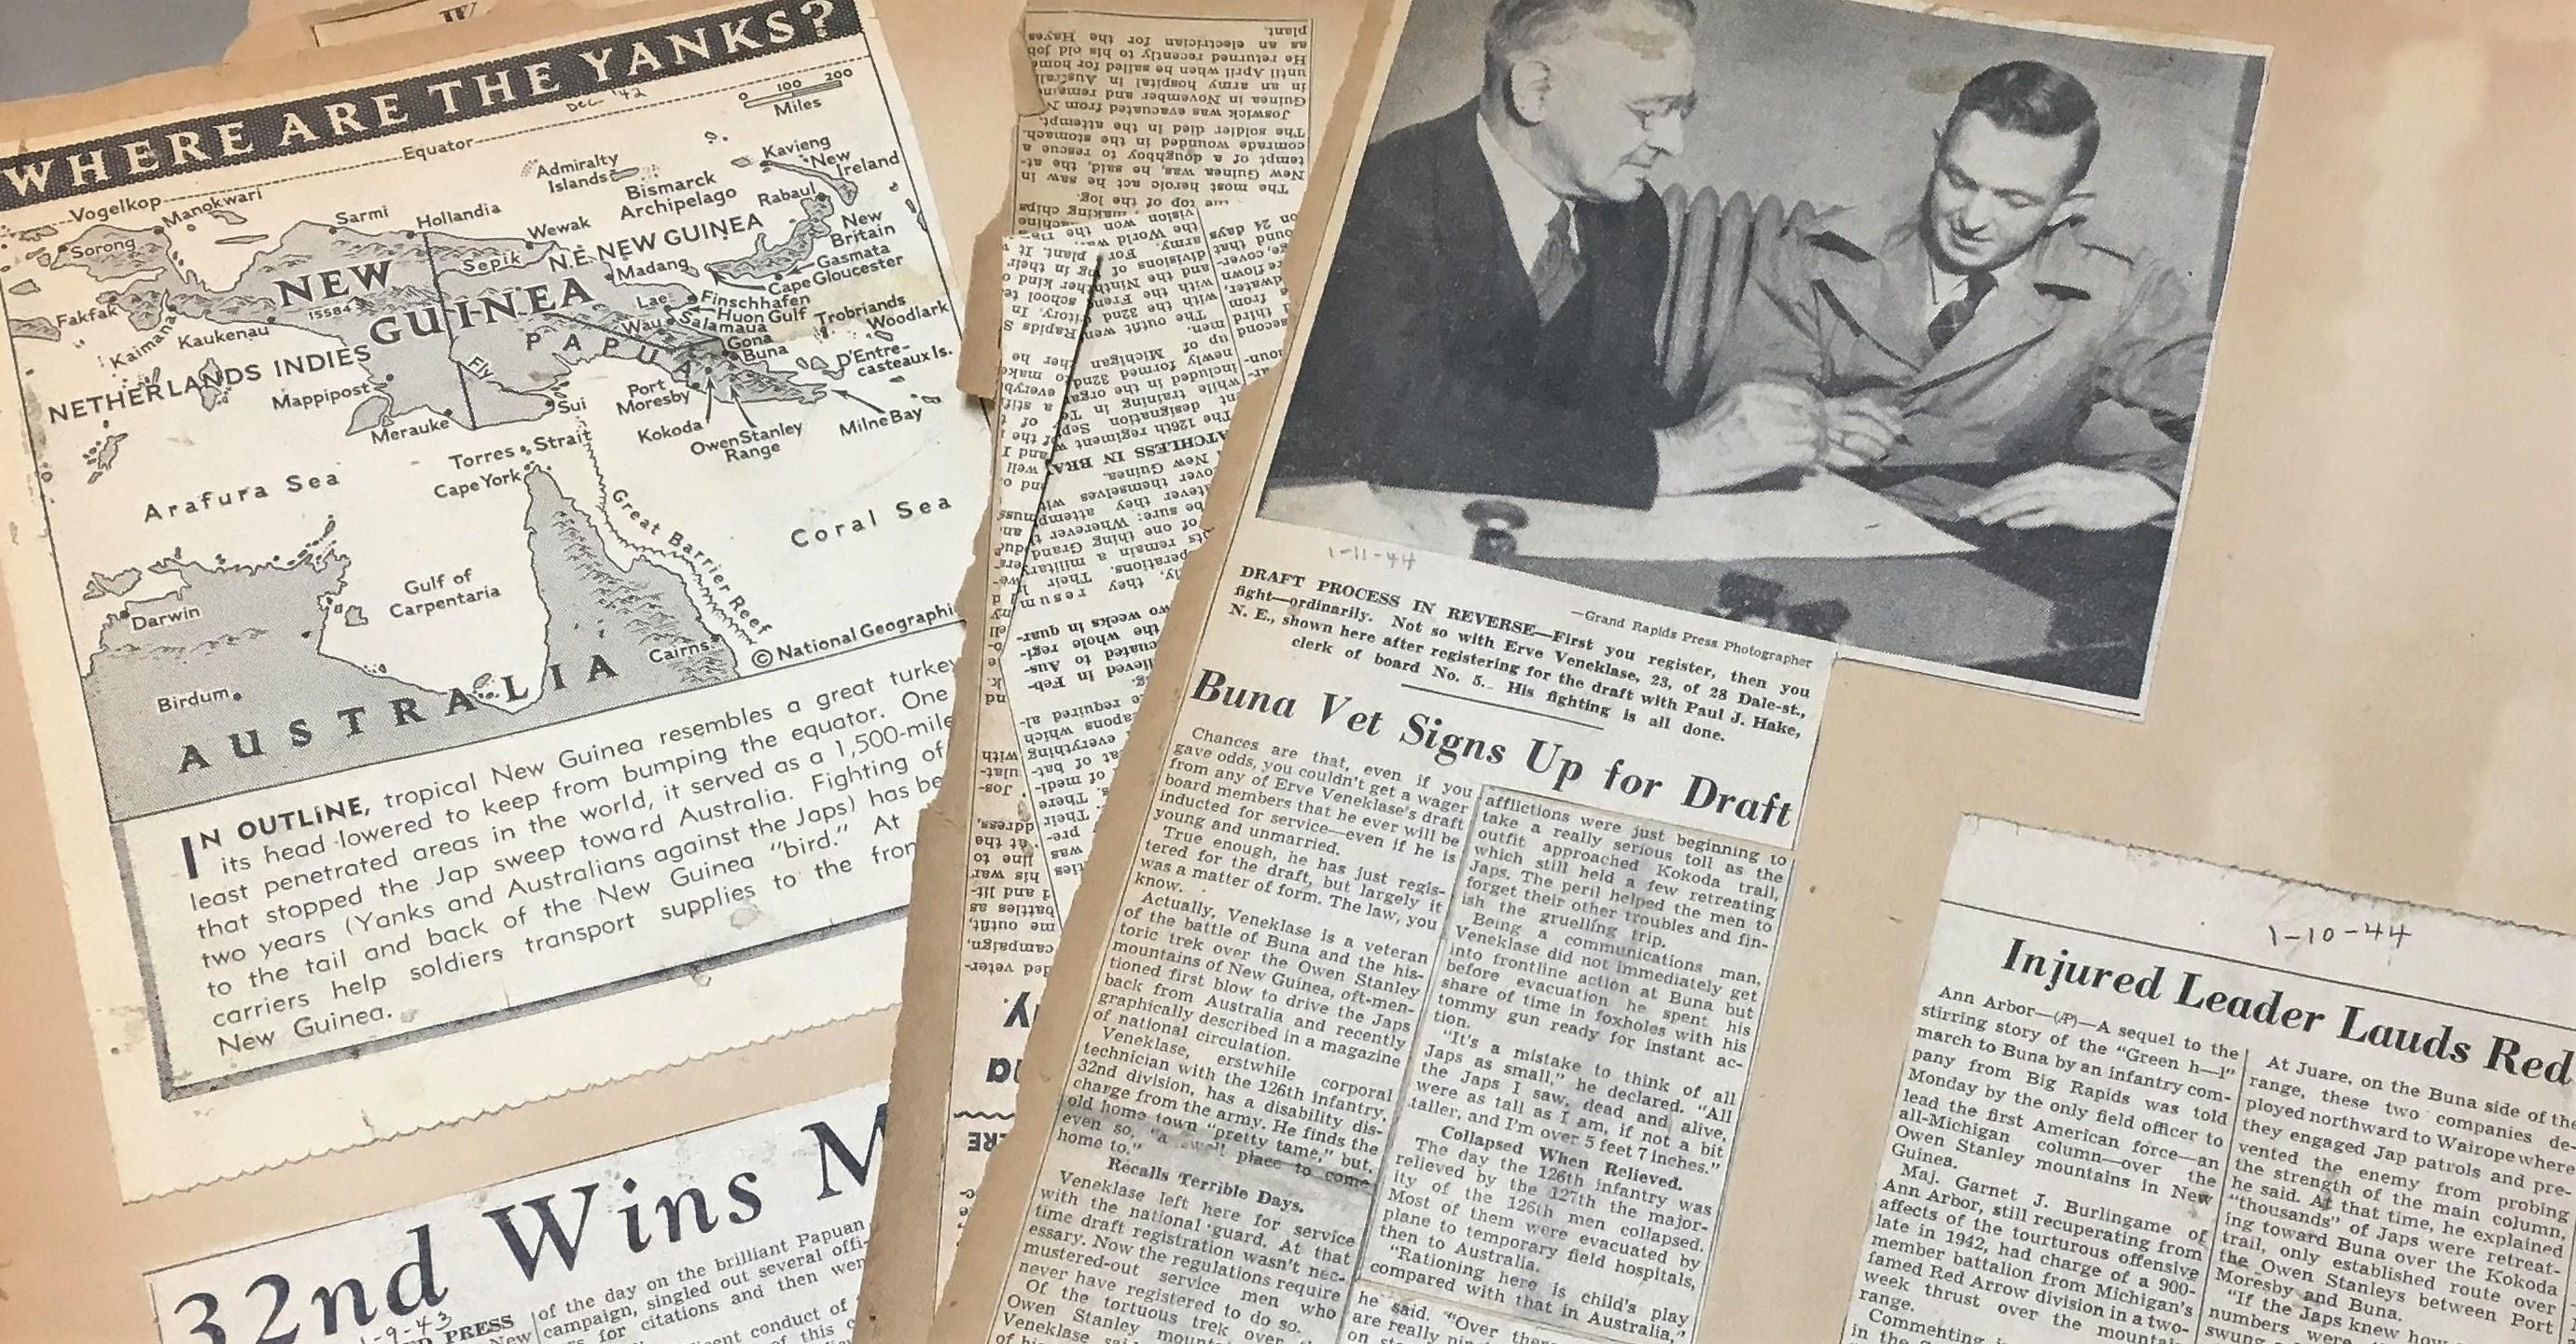 Close-up view of deteriorating newspaper scrapbooks from World War II.